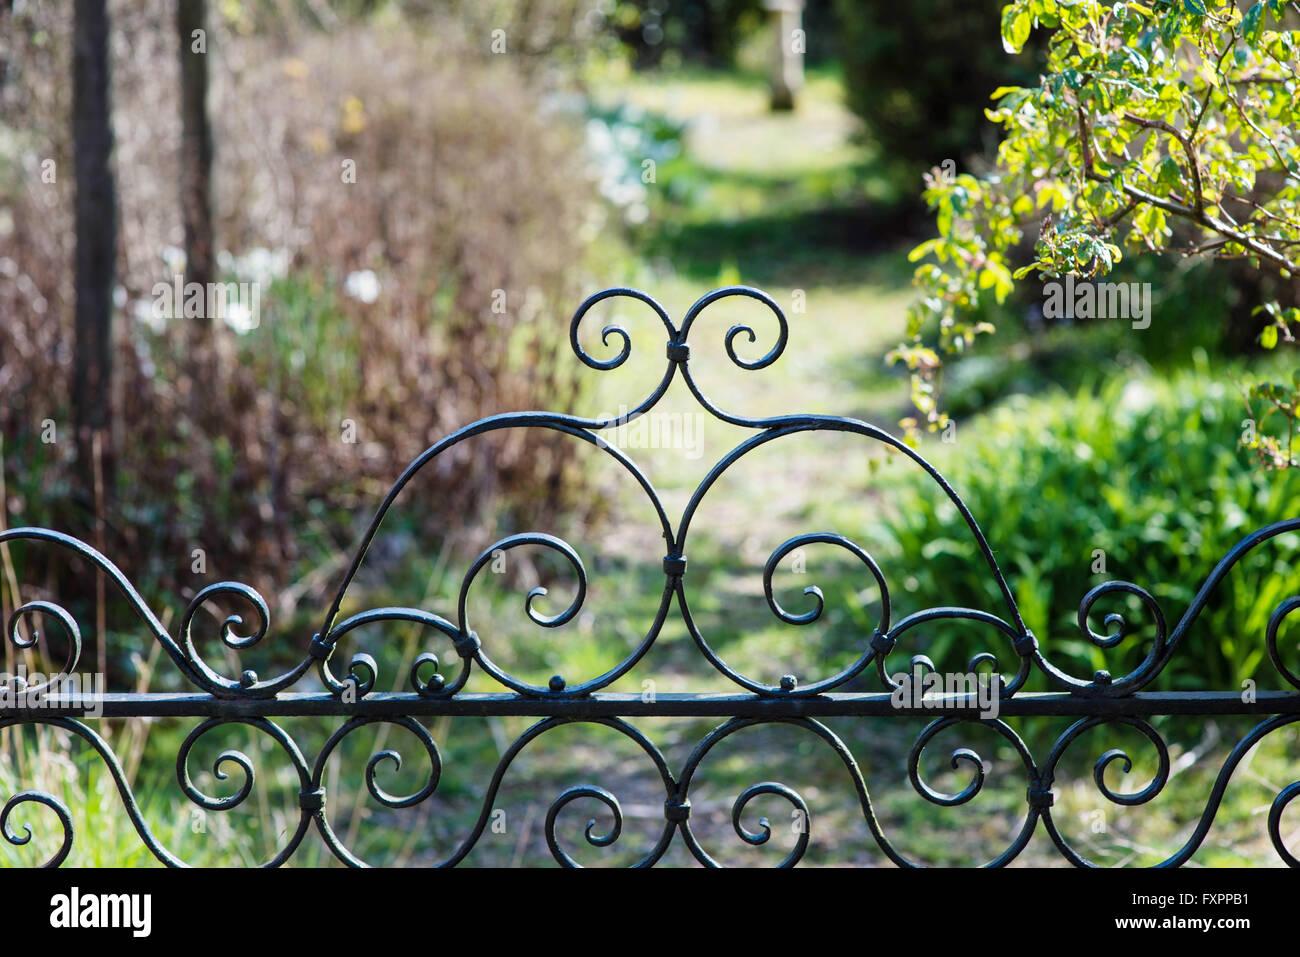 Garden Gate Iron Stock Photos & Garden Gate Iron Stock Images - Alamy